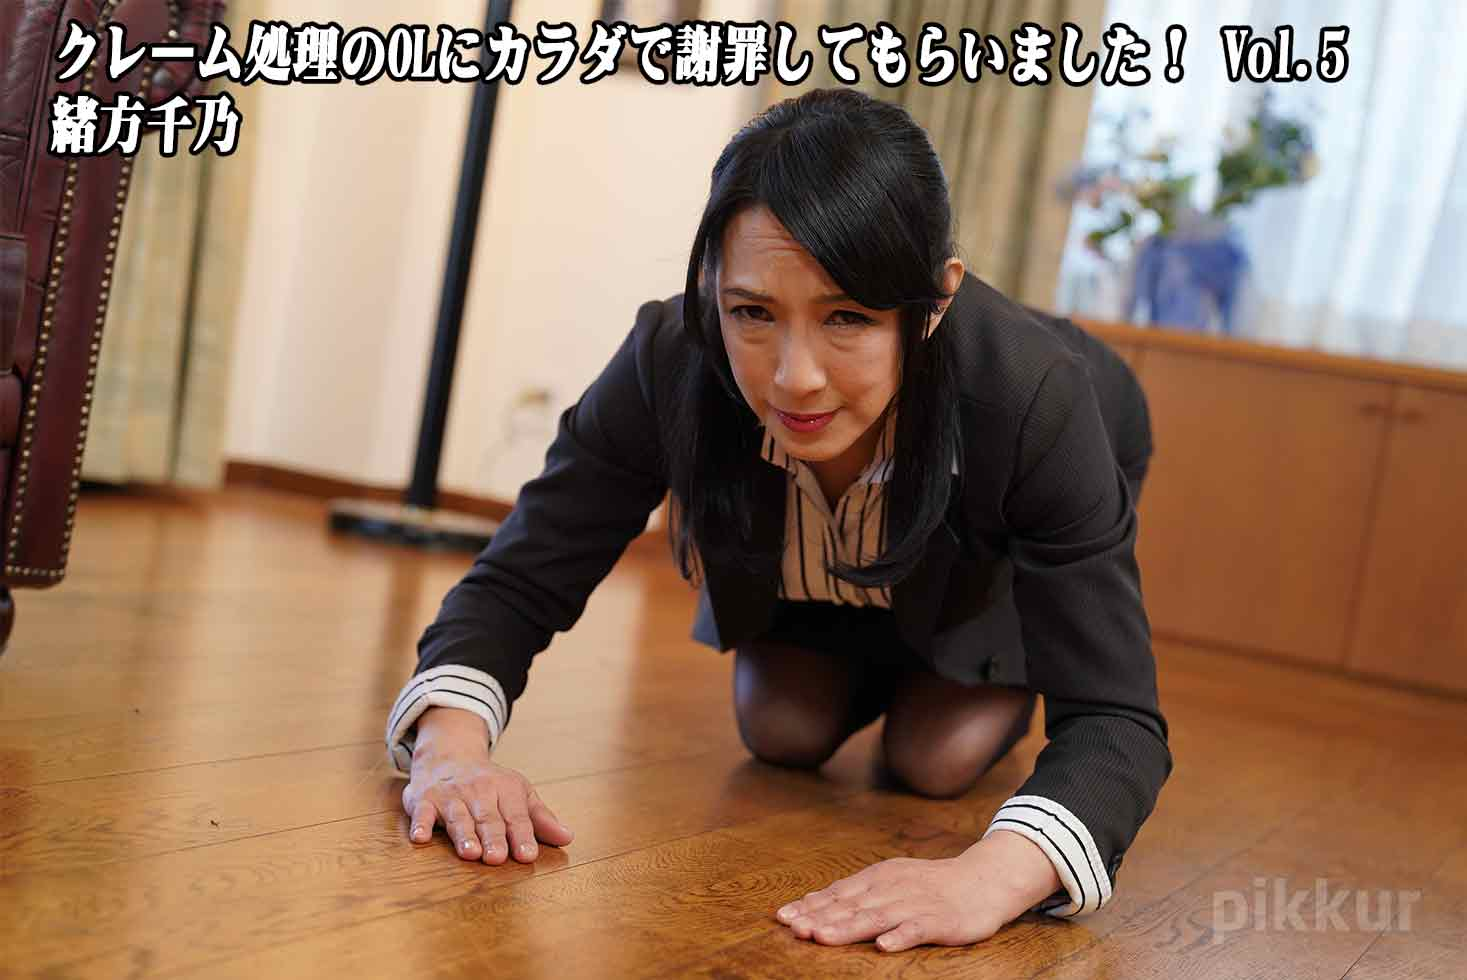 OL 中出し 日本人 美乳 バイブ 69 バック 騎乗位 正上位 美脚 生ハメ 生姦 クンニ フェラ 美尻 スレンダー 指マン